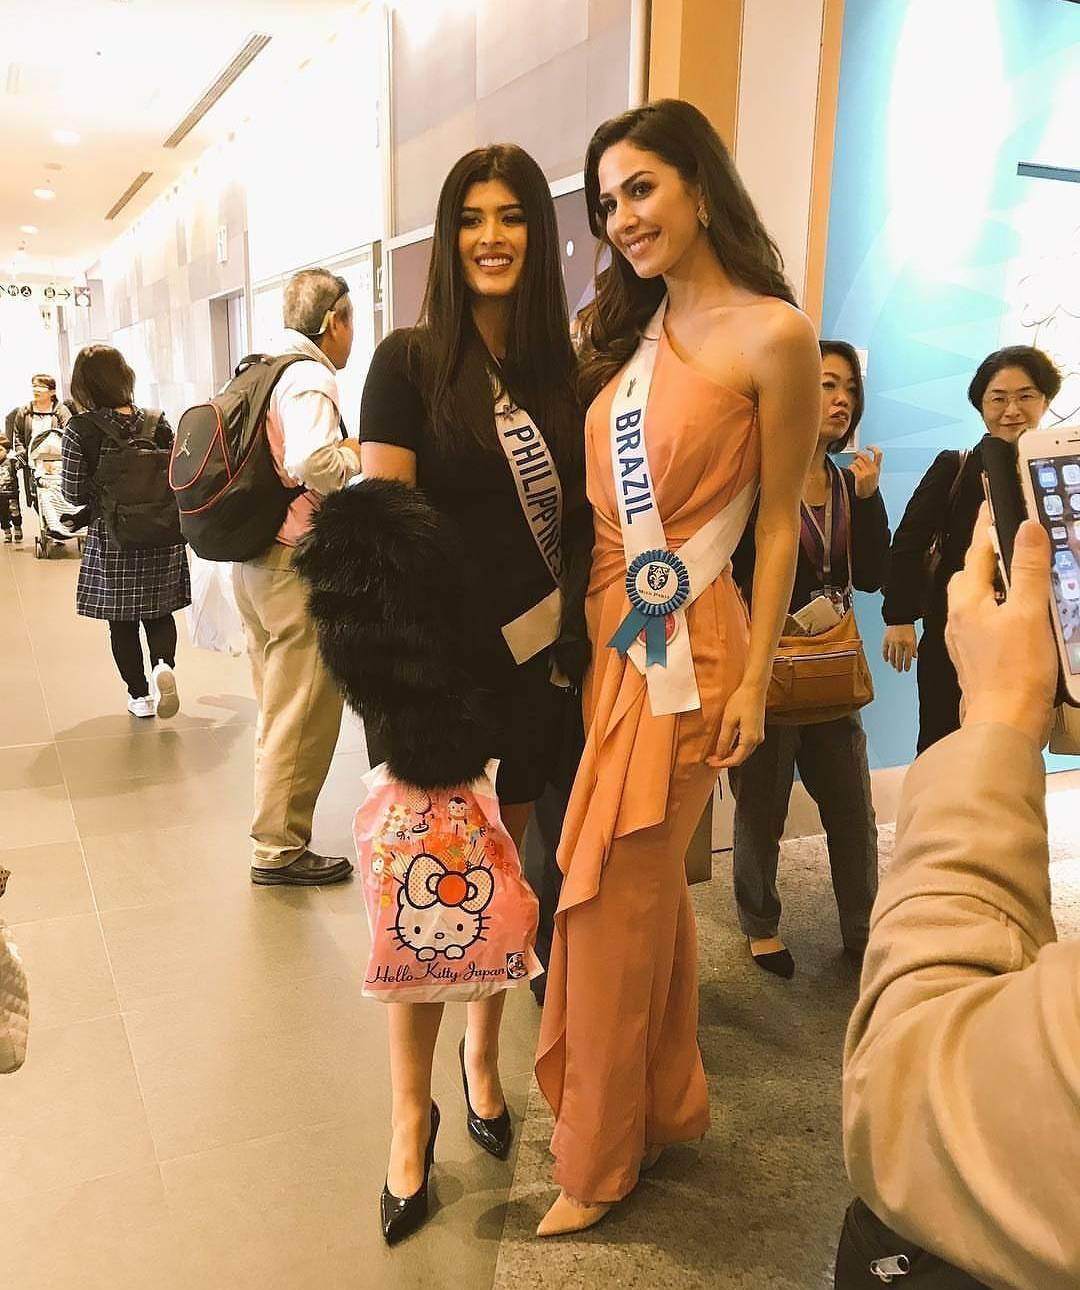 bruna zanardo, miss brasil hispanoamericana 2021/miss brasil internacional 2017/miss brasil terra 2016. - Página 13 56445939_23498364_395491627537419_7650295807488294912_n